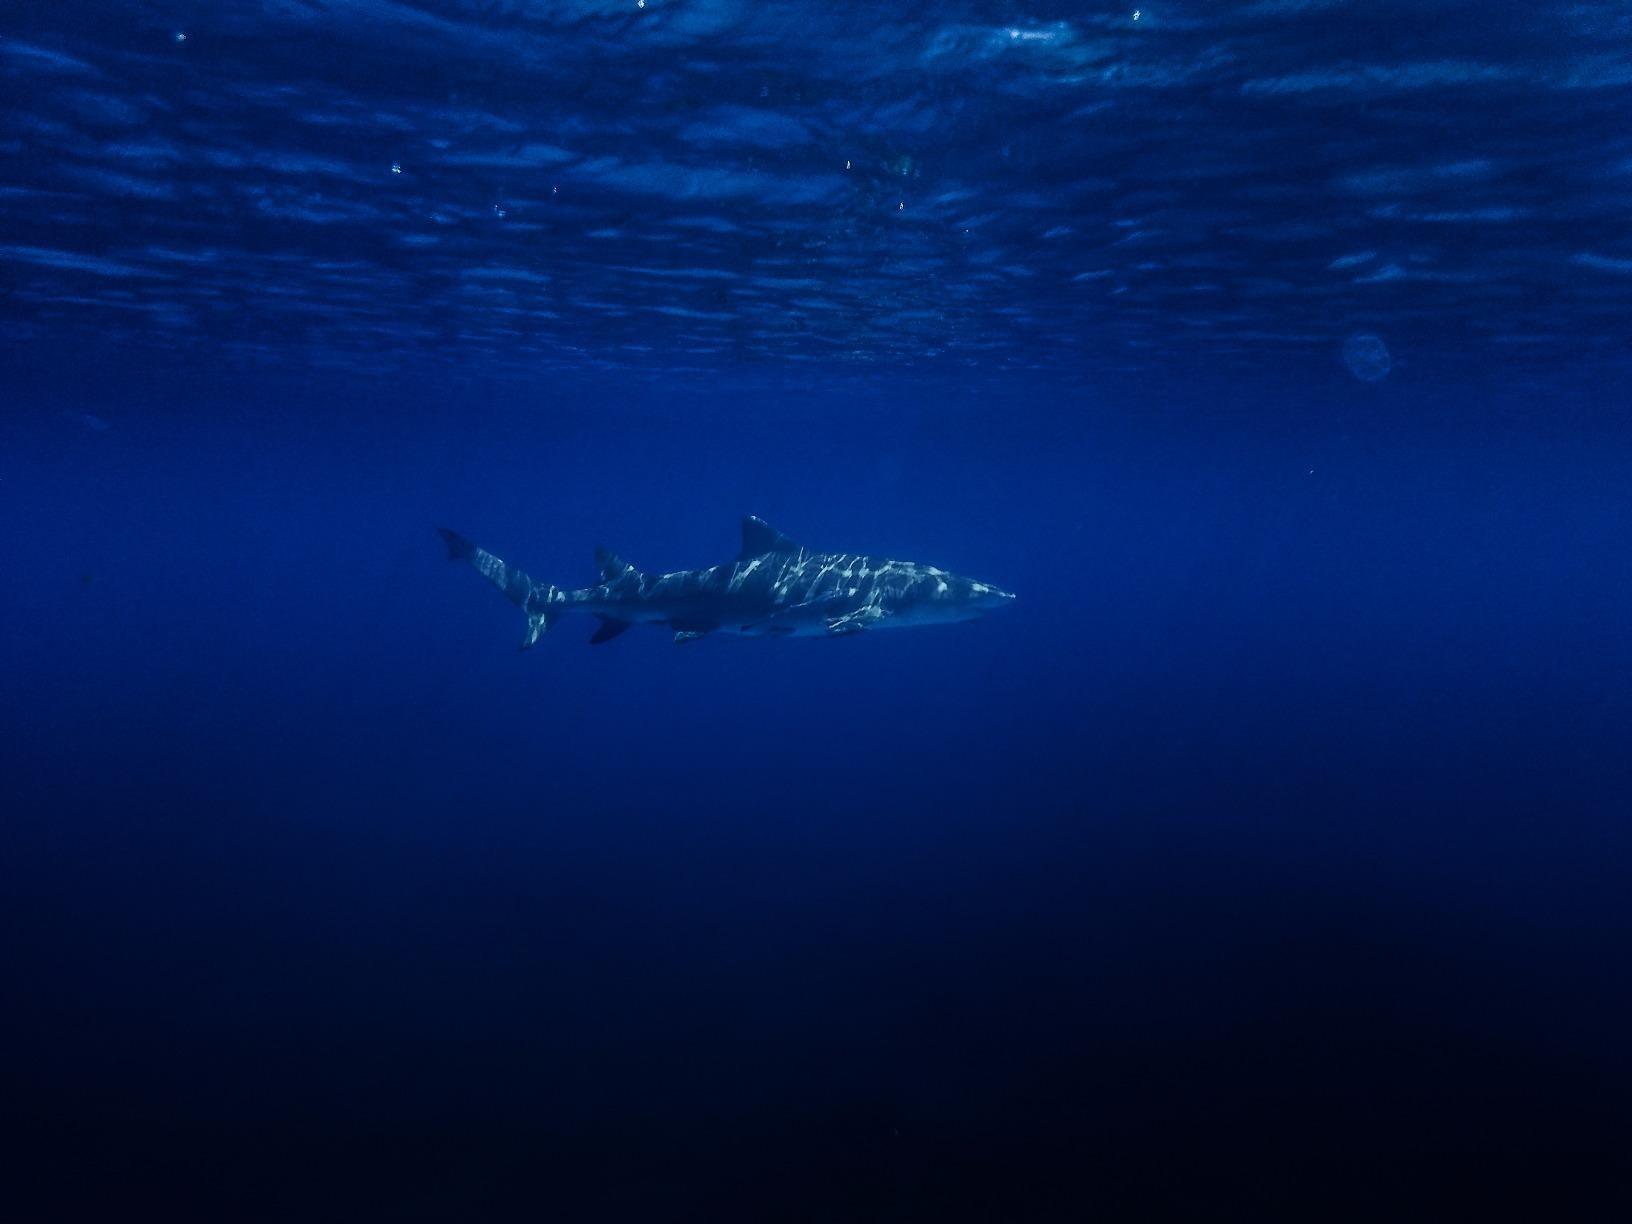 reviewer image of a shark taken underwater